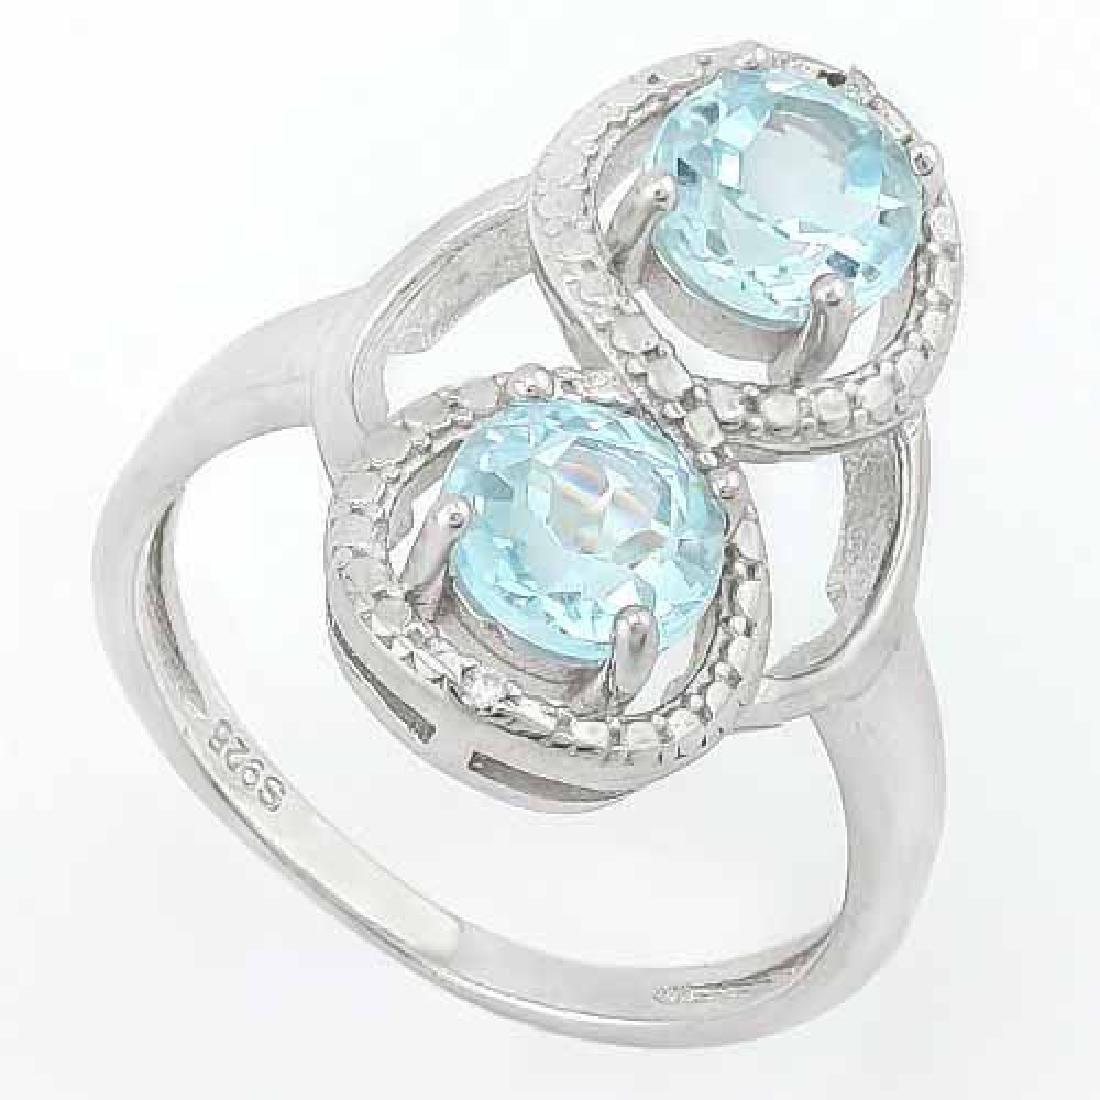 2 CARAT BABY SWISS BLUE TOPAZS & GENUINE DIAMONDS 925 S